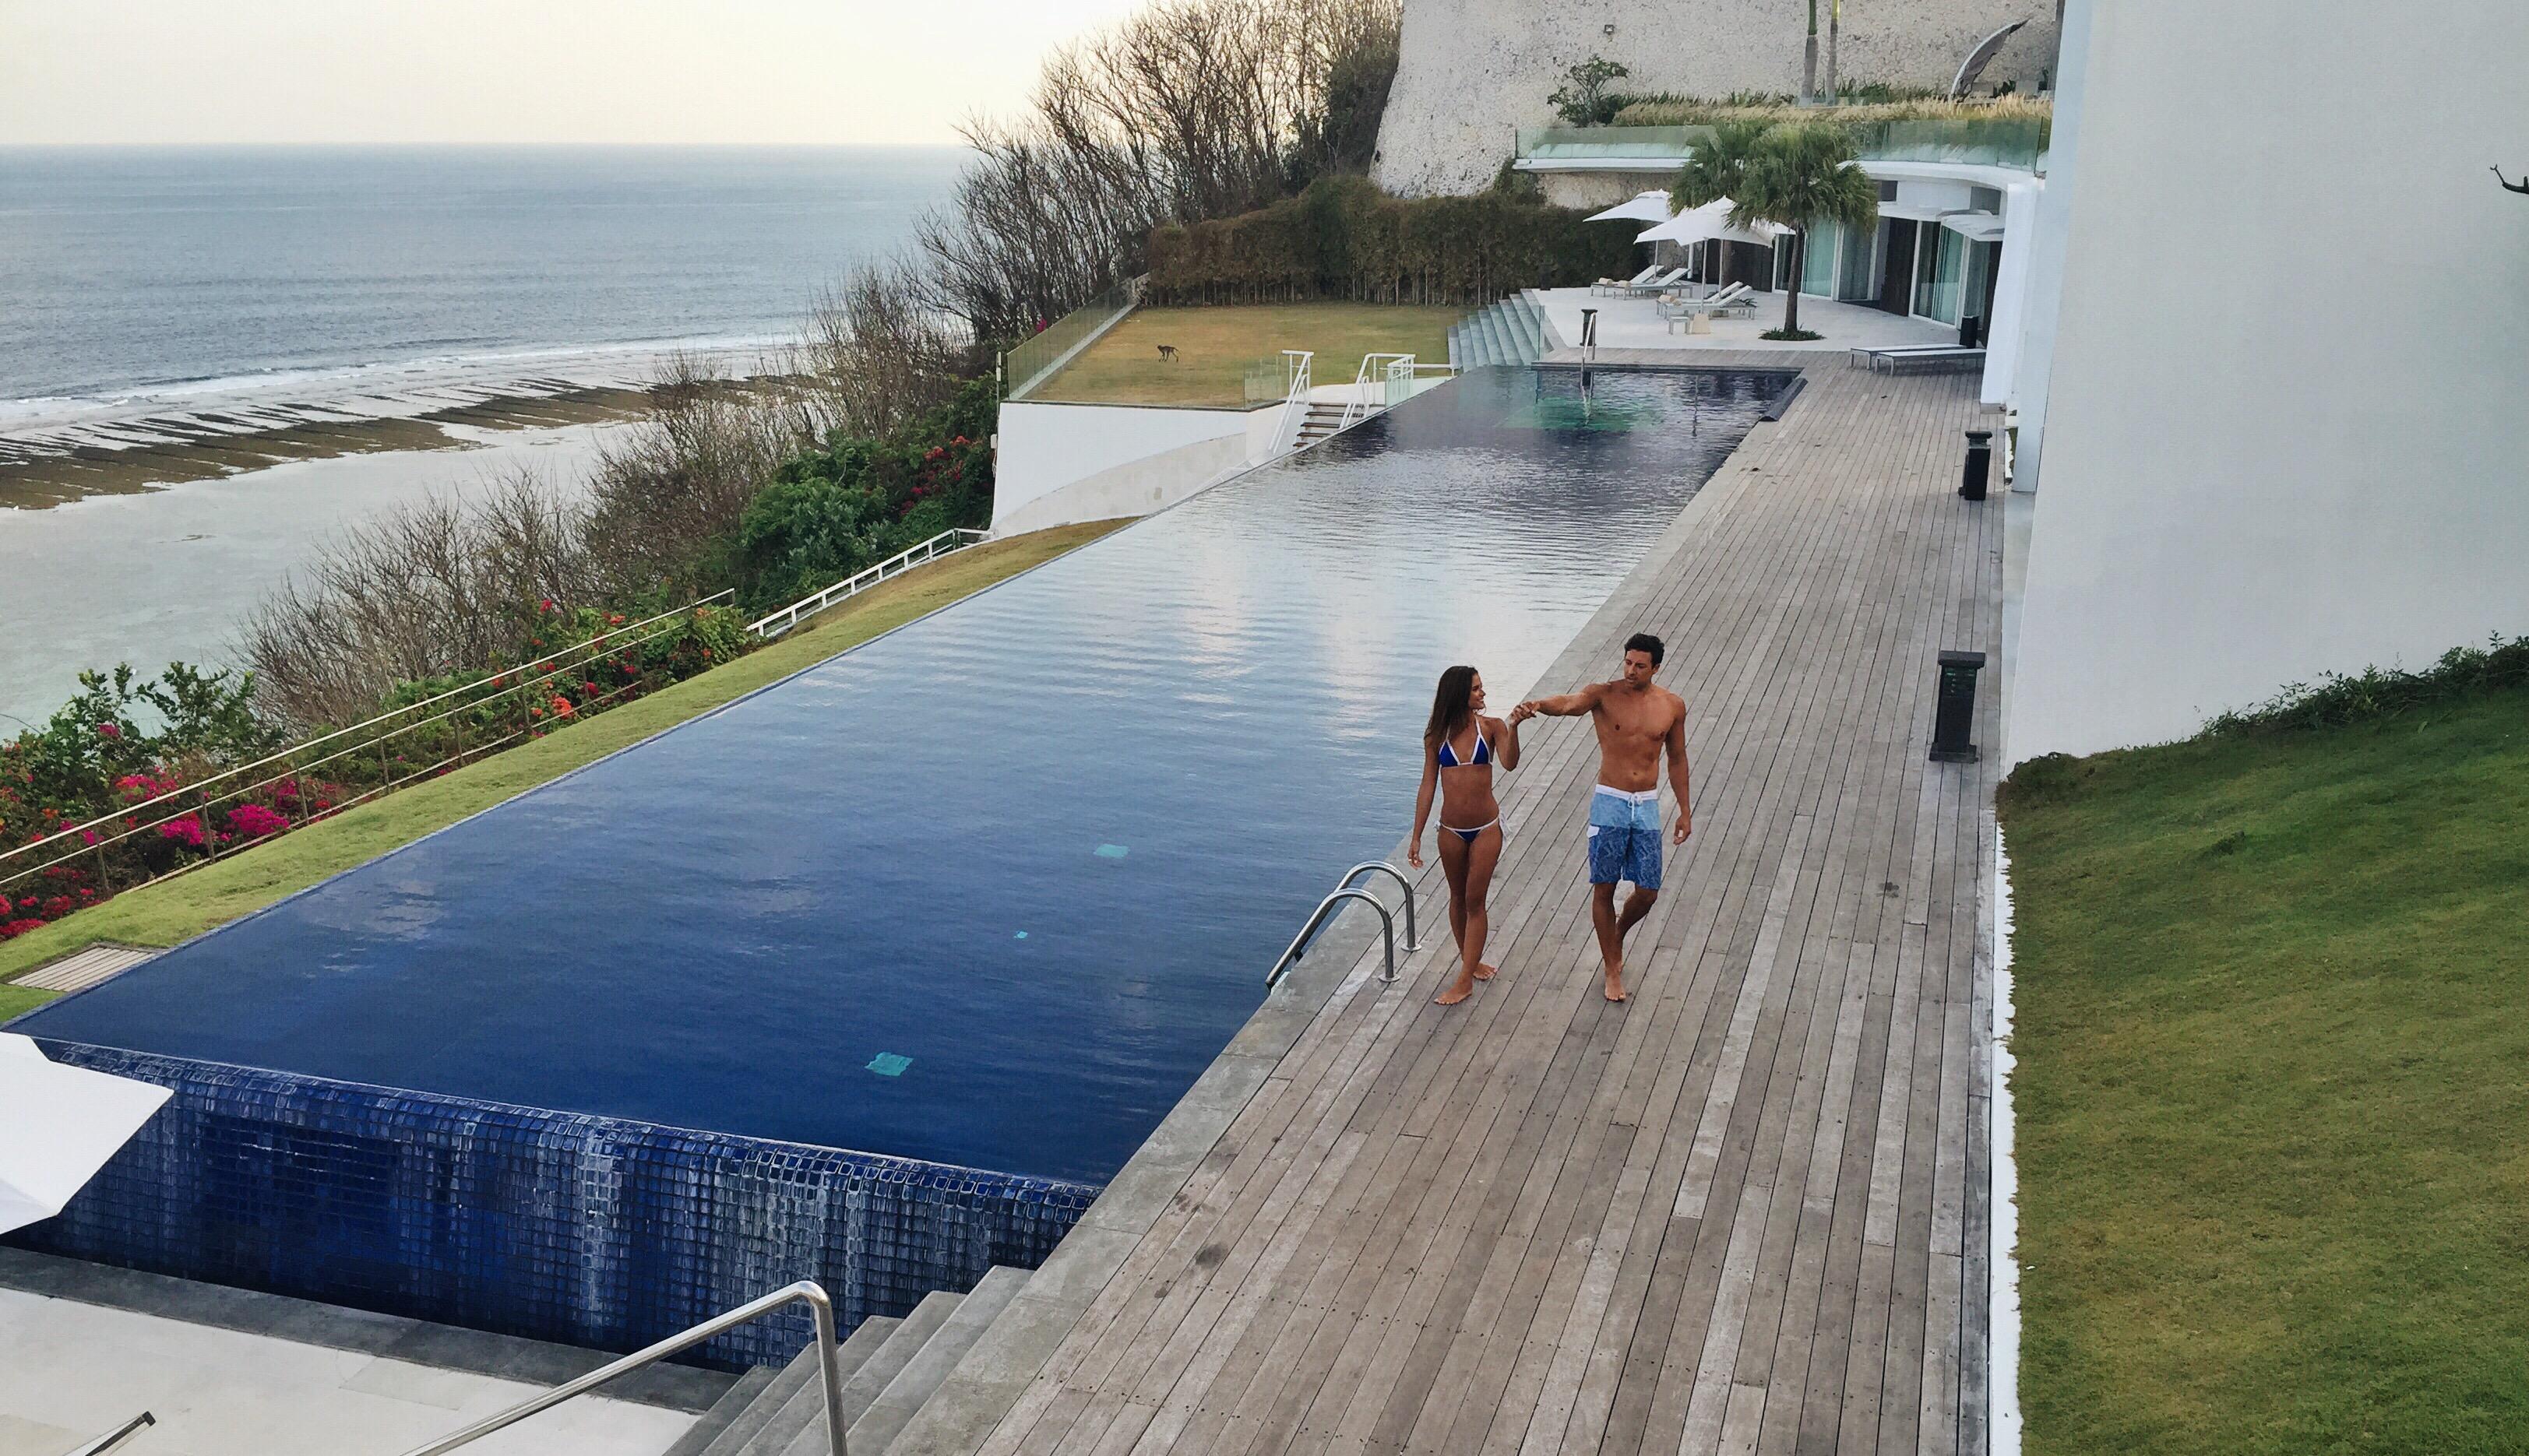 Villa Latitude Villa 3322 Uluwatu, Villa Getaways, Bali Vacations, helen owen, Zack Kalter